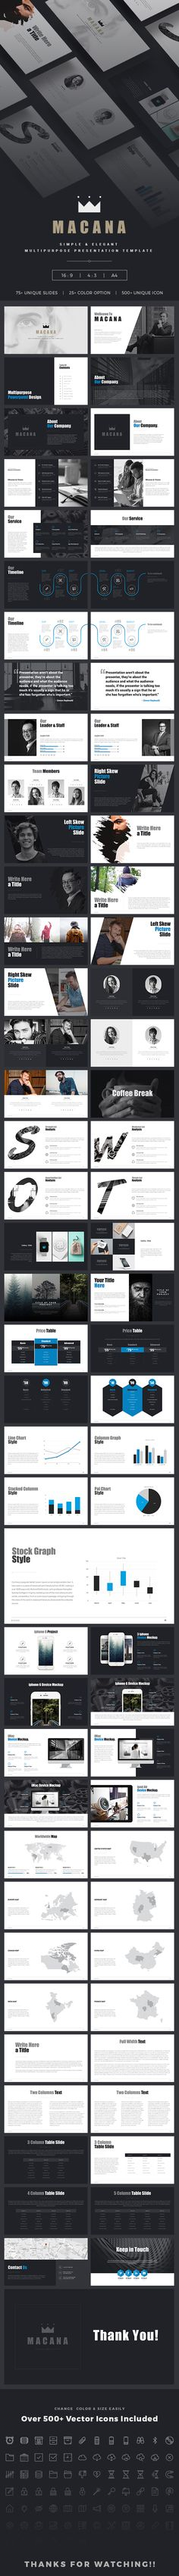 Macana Powerpoint Presentation Template #advertisement #infographics #marketing